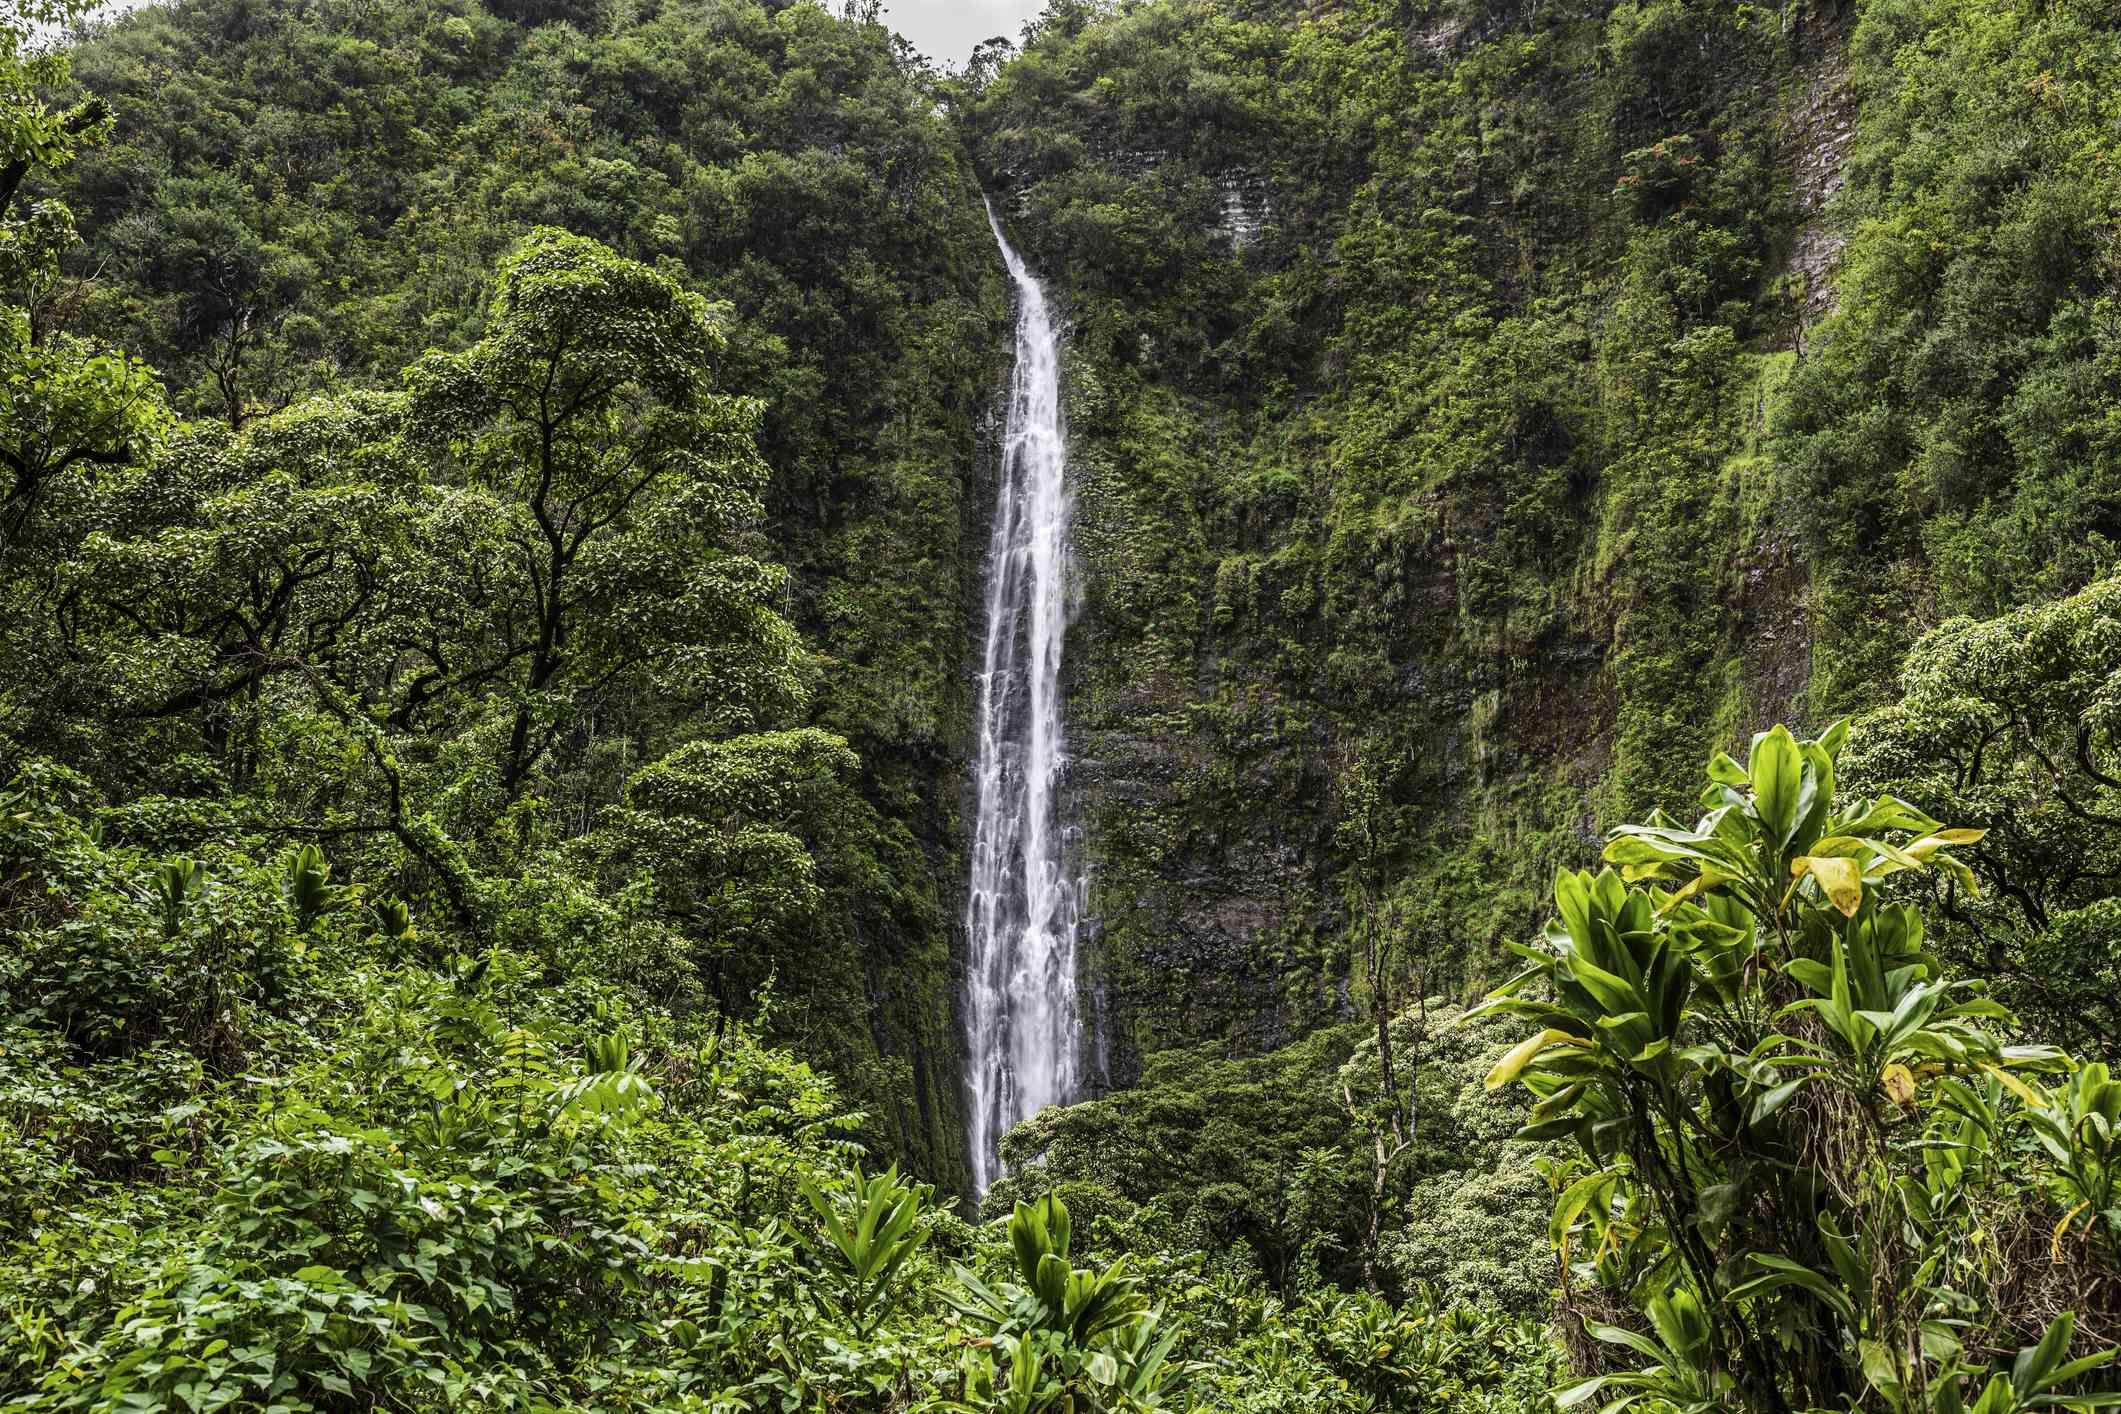 Waimoku falls at Pipiwai Trail, Maui, Hawaii